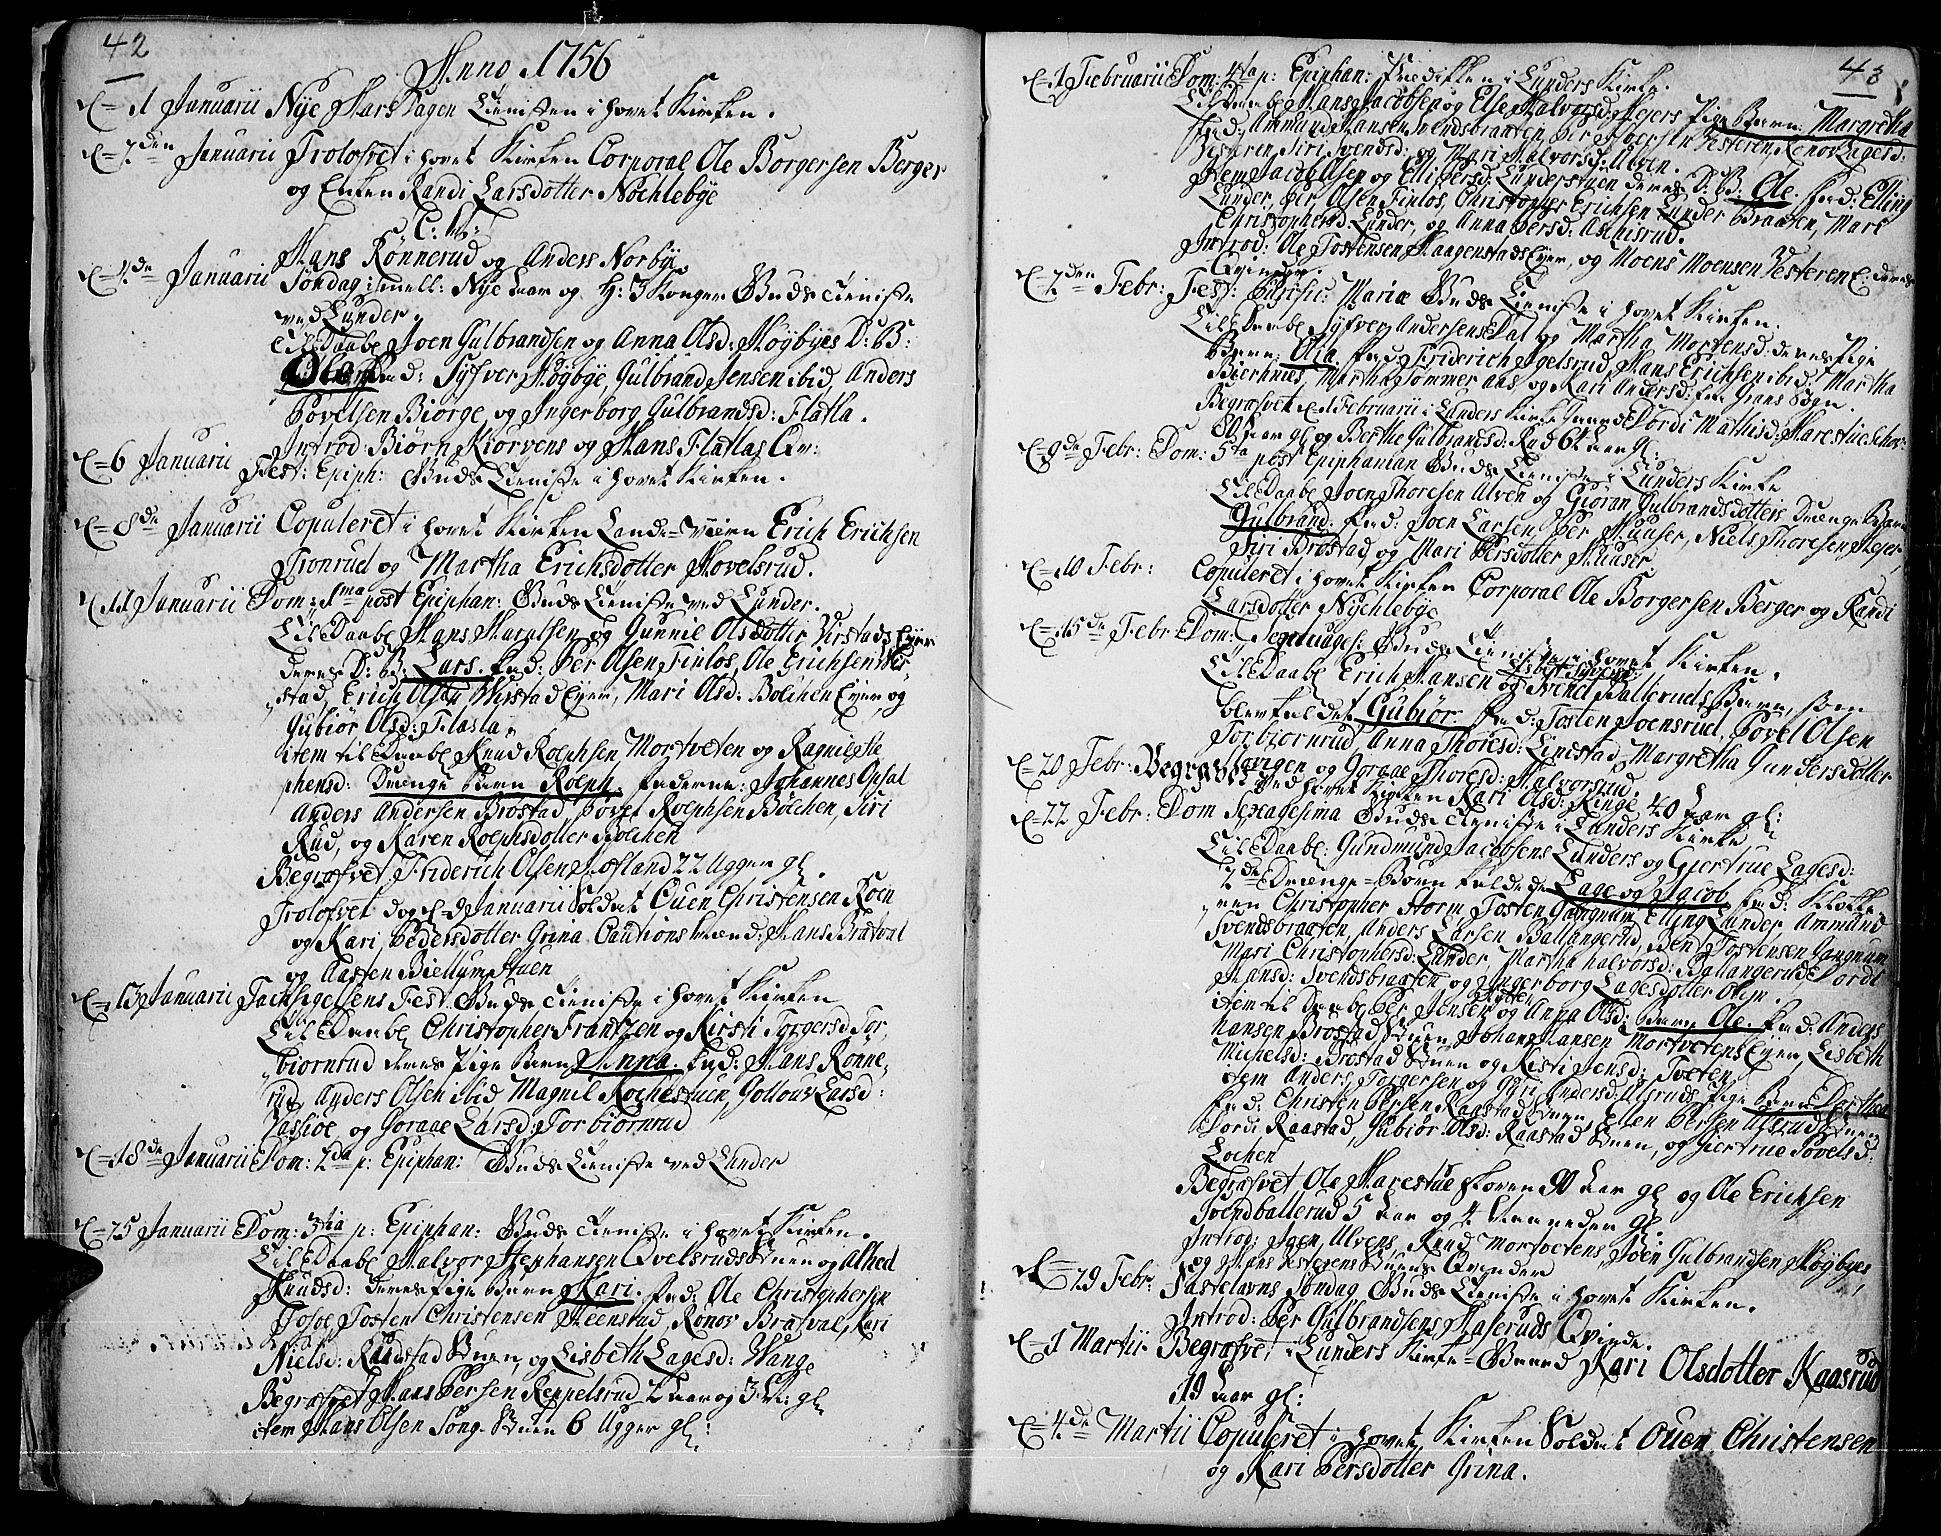 SAH, Jevnaker prestekontor, Ministerialbok nr. 3, 1752-1799, s. 42-43